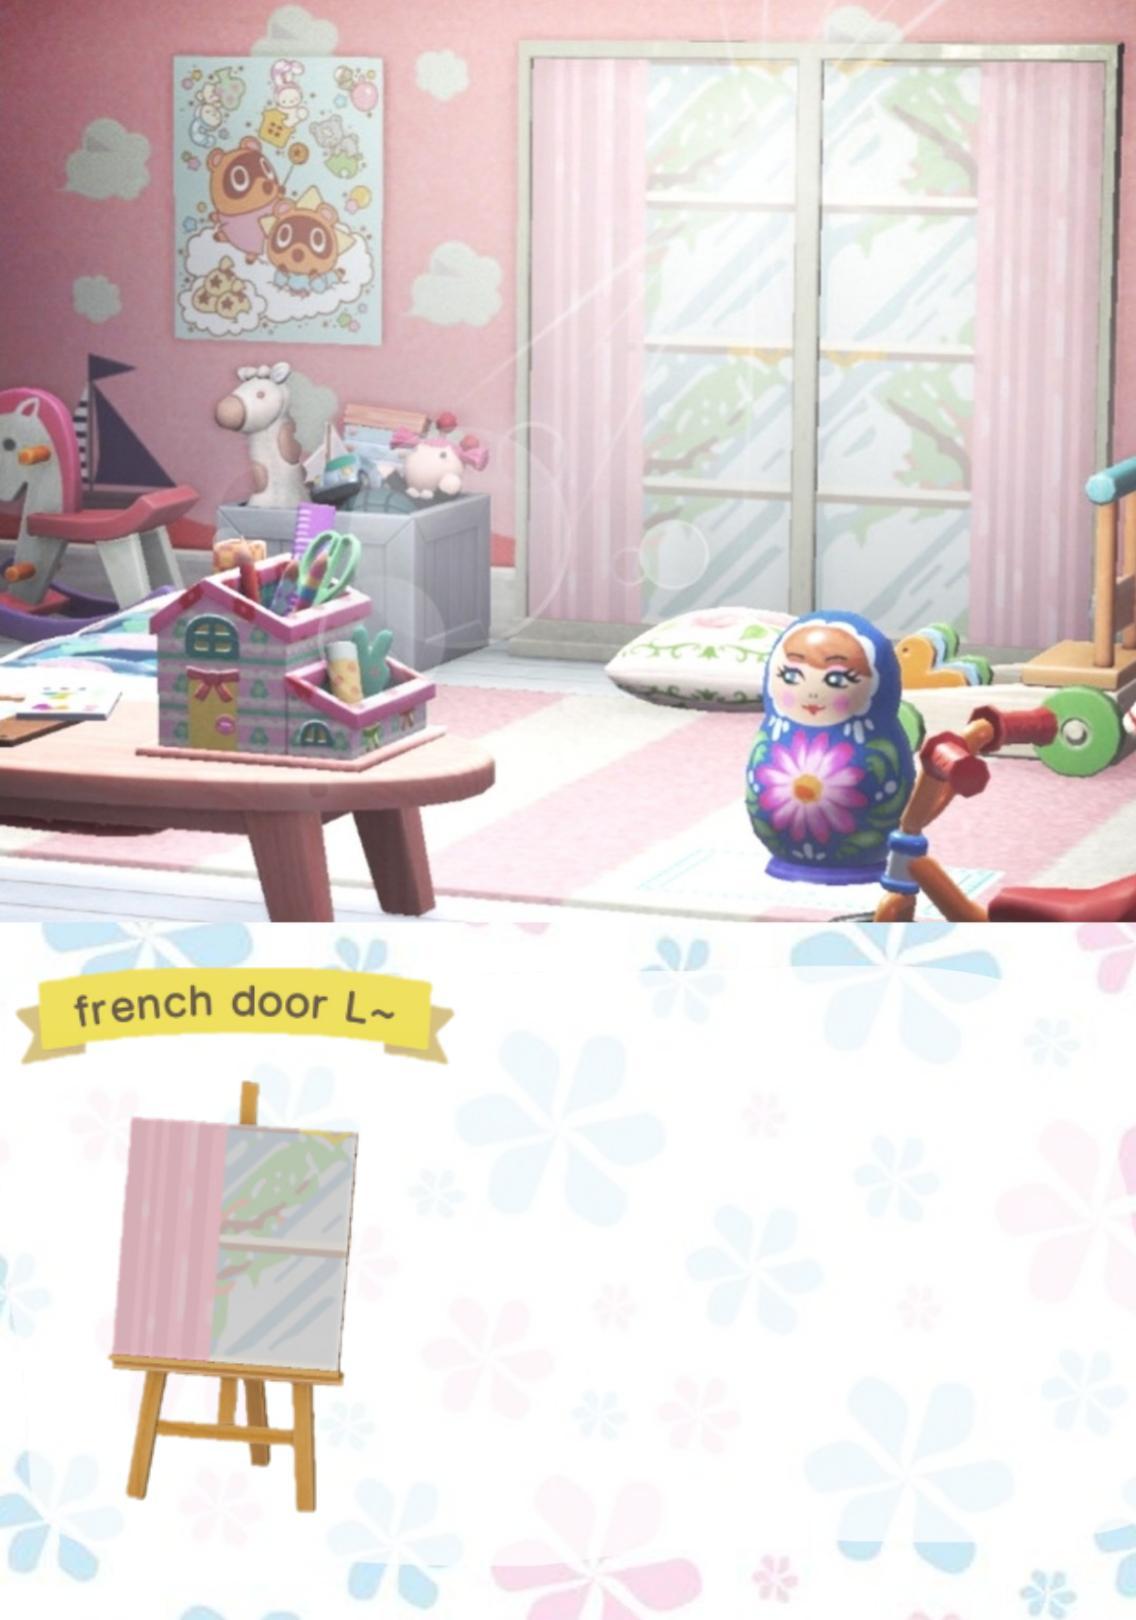 French door design in cool pink